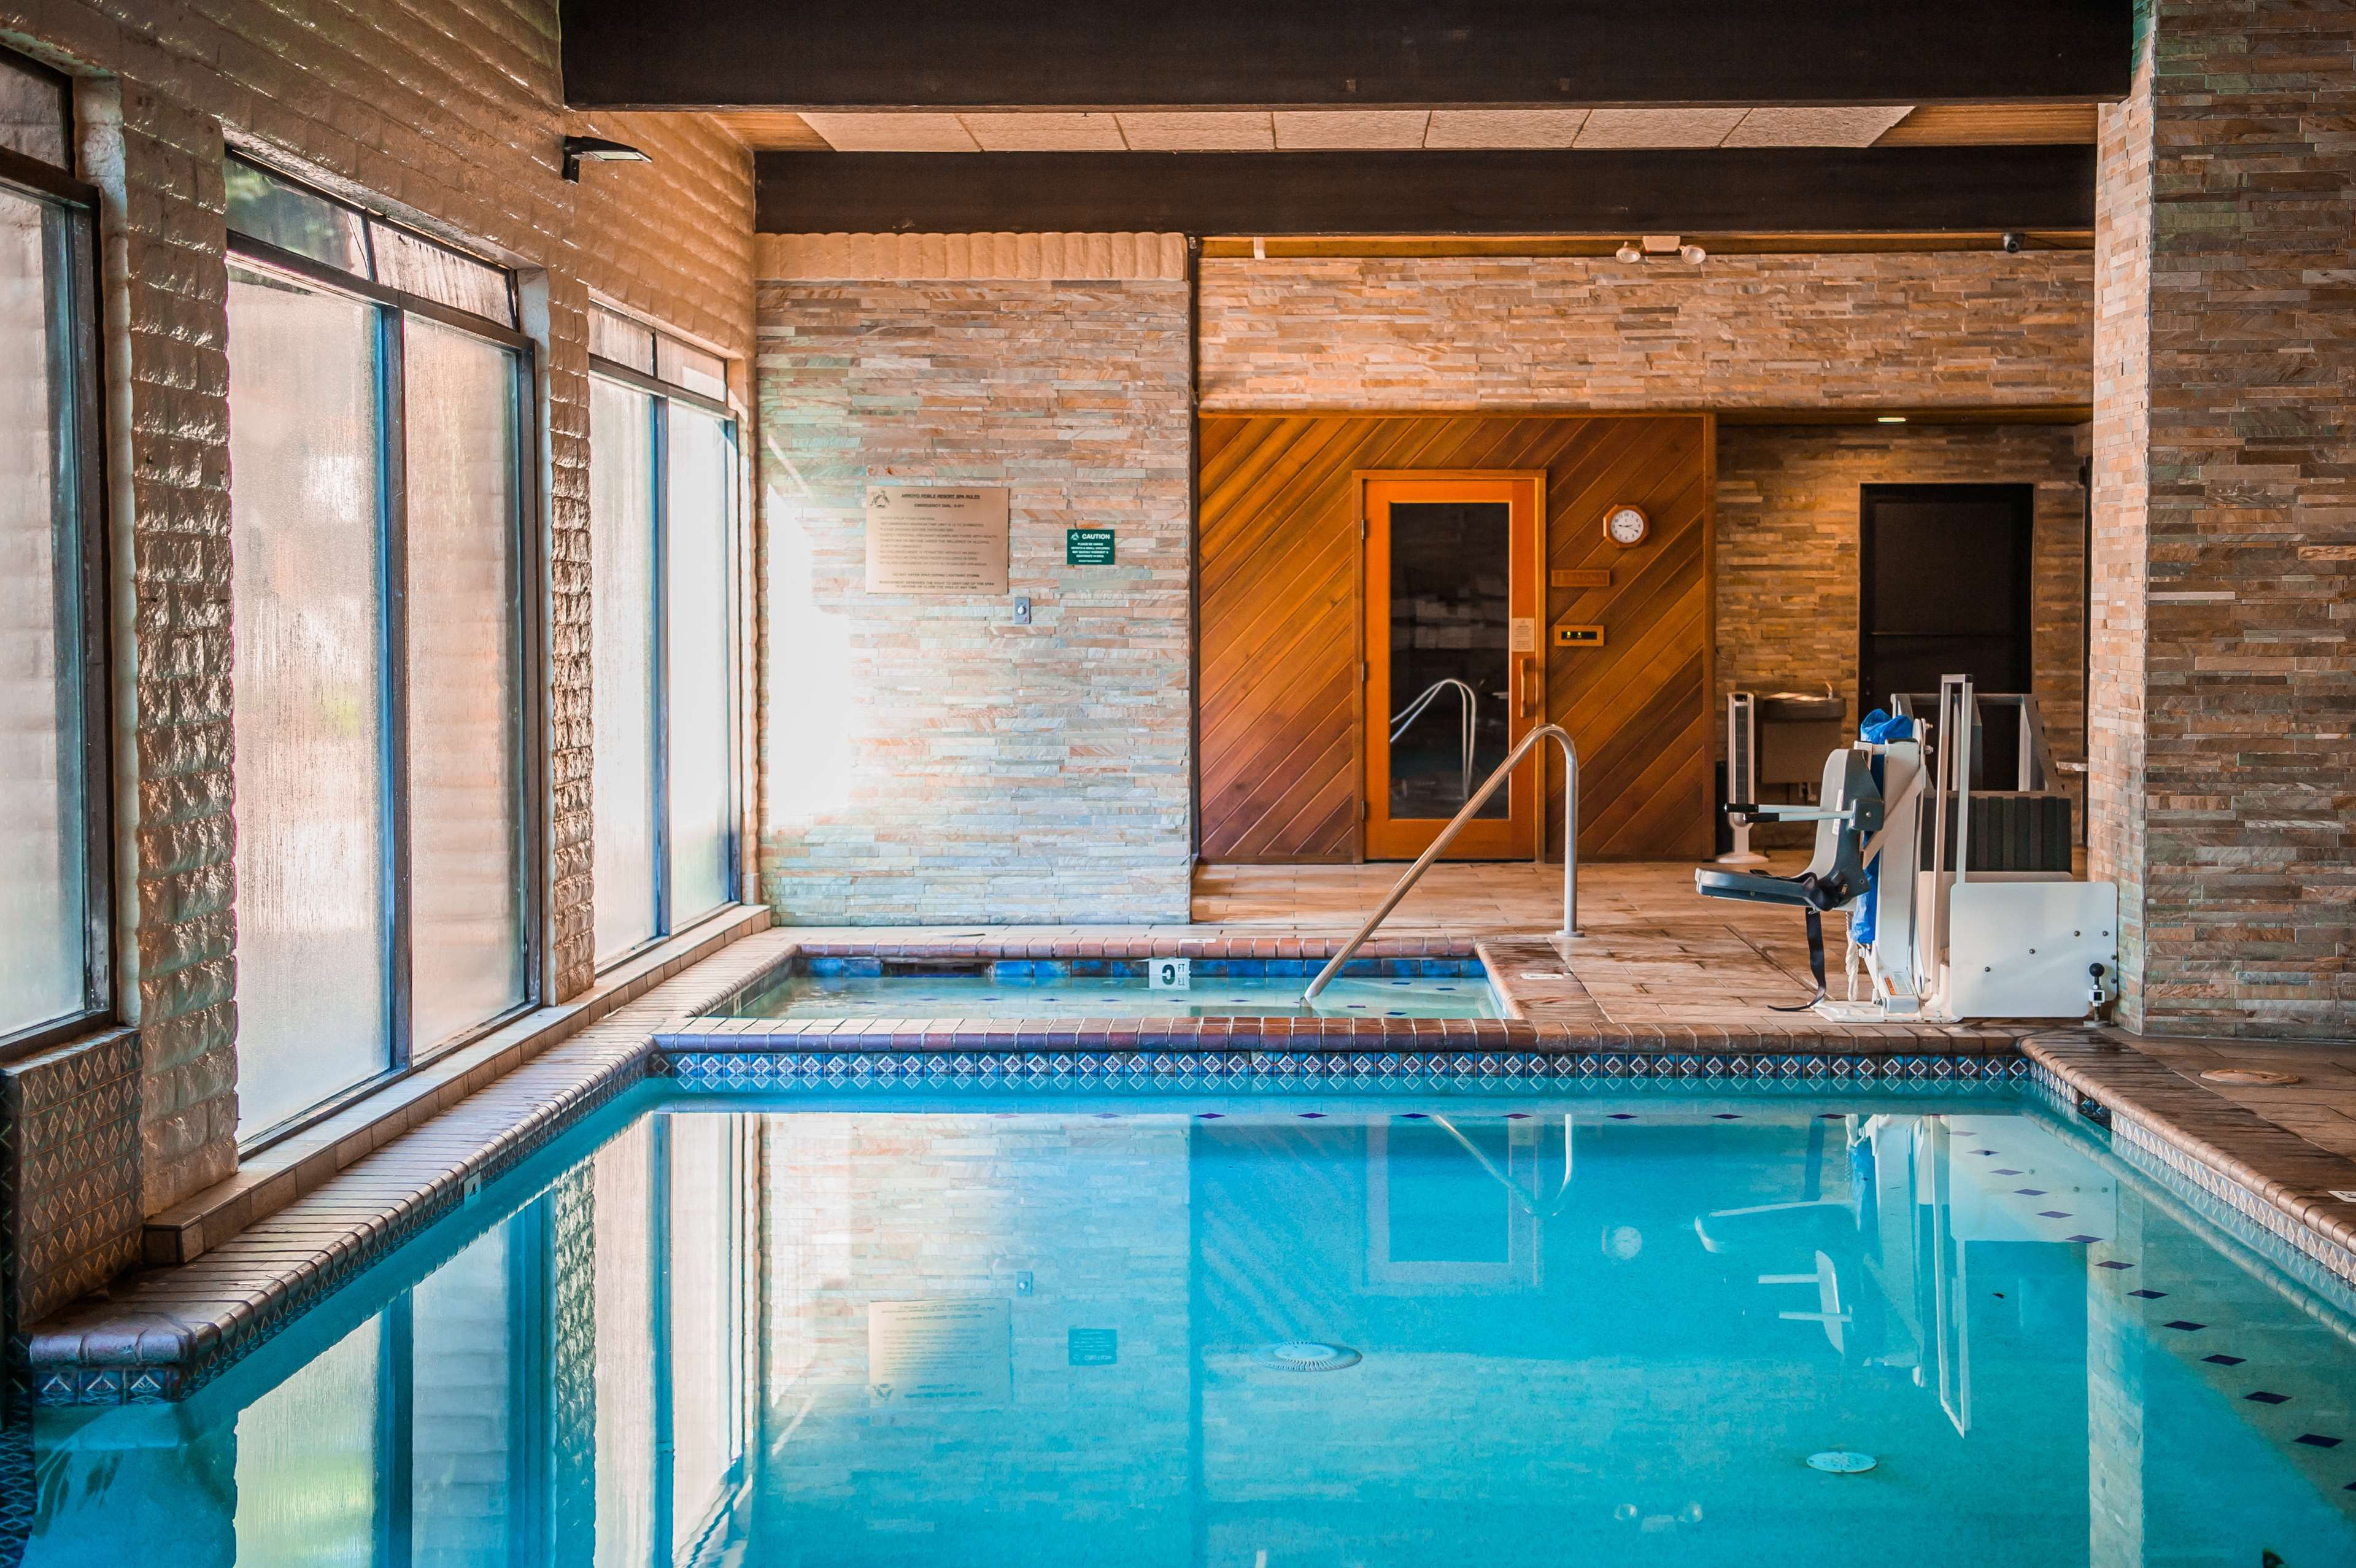 Best Western Plus Arroyo Roble Hotel & Creekside Villas image 14